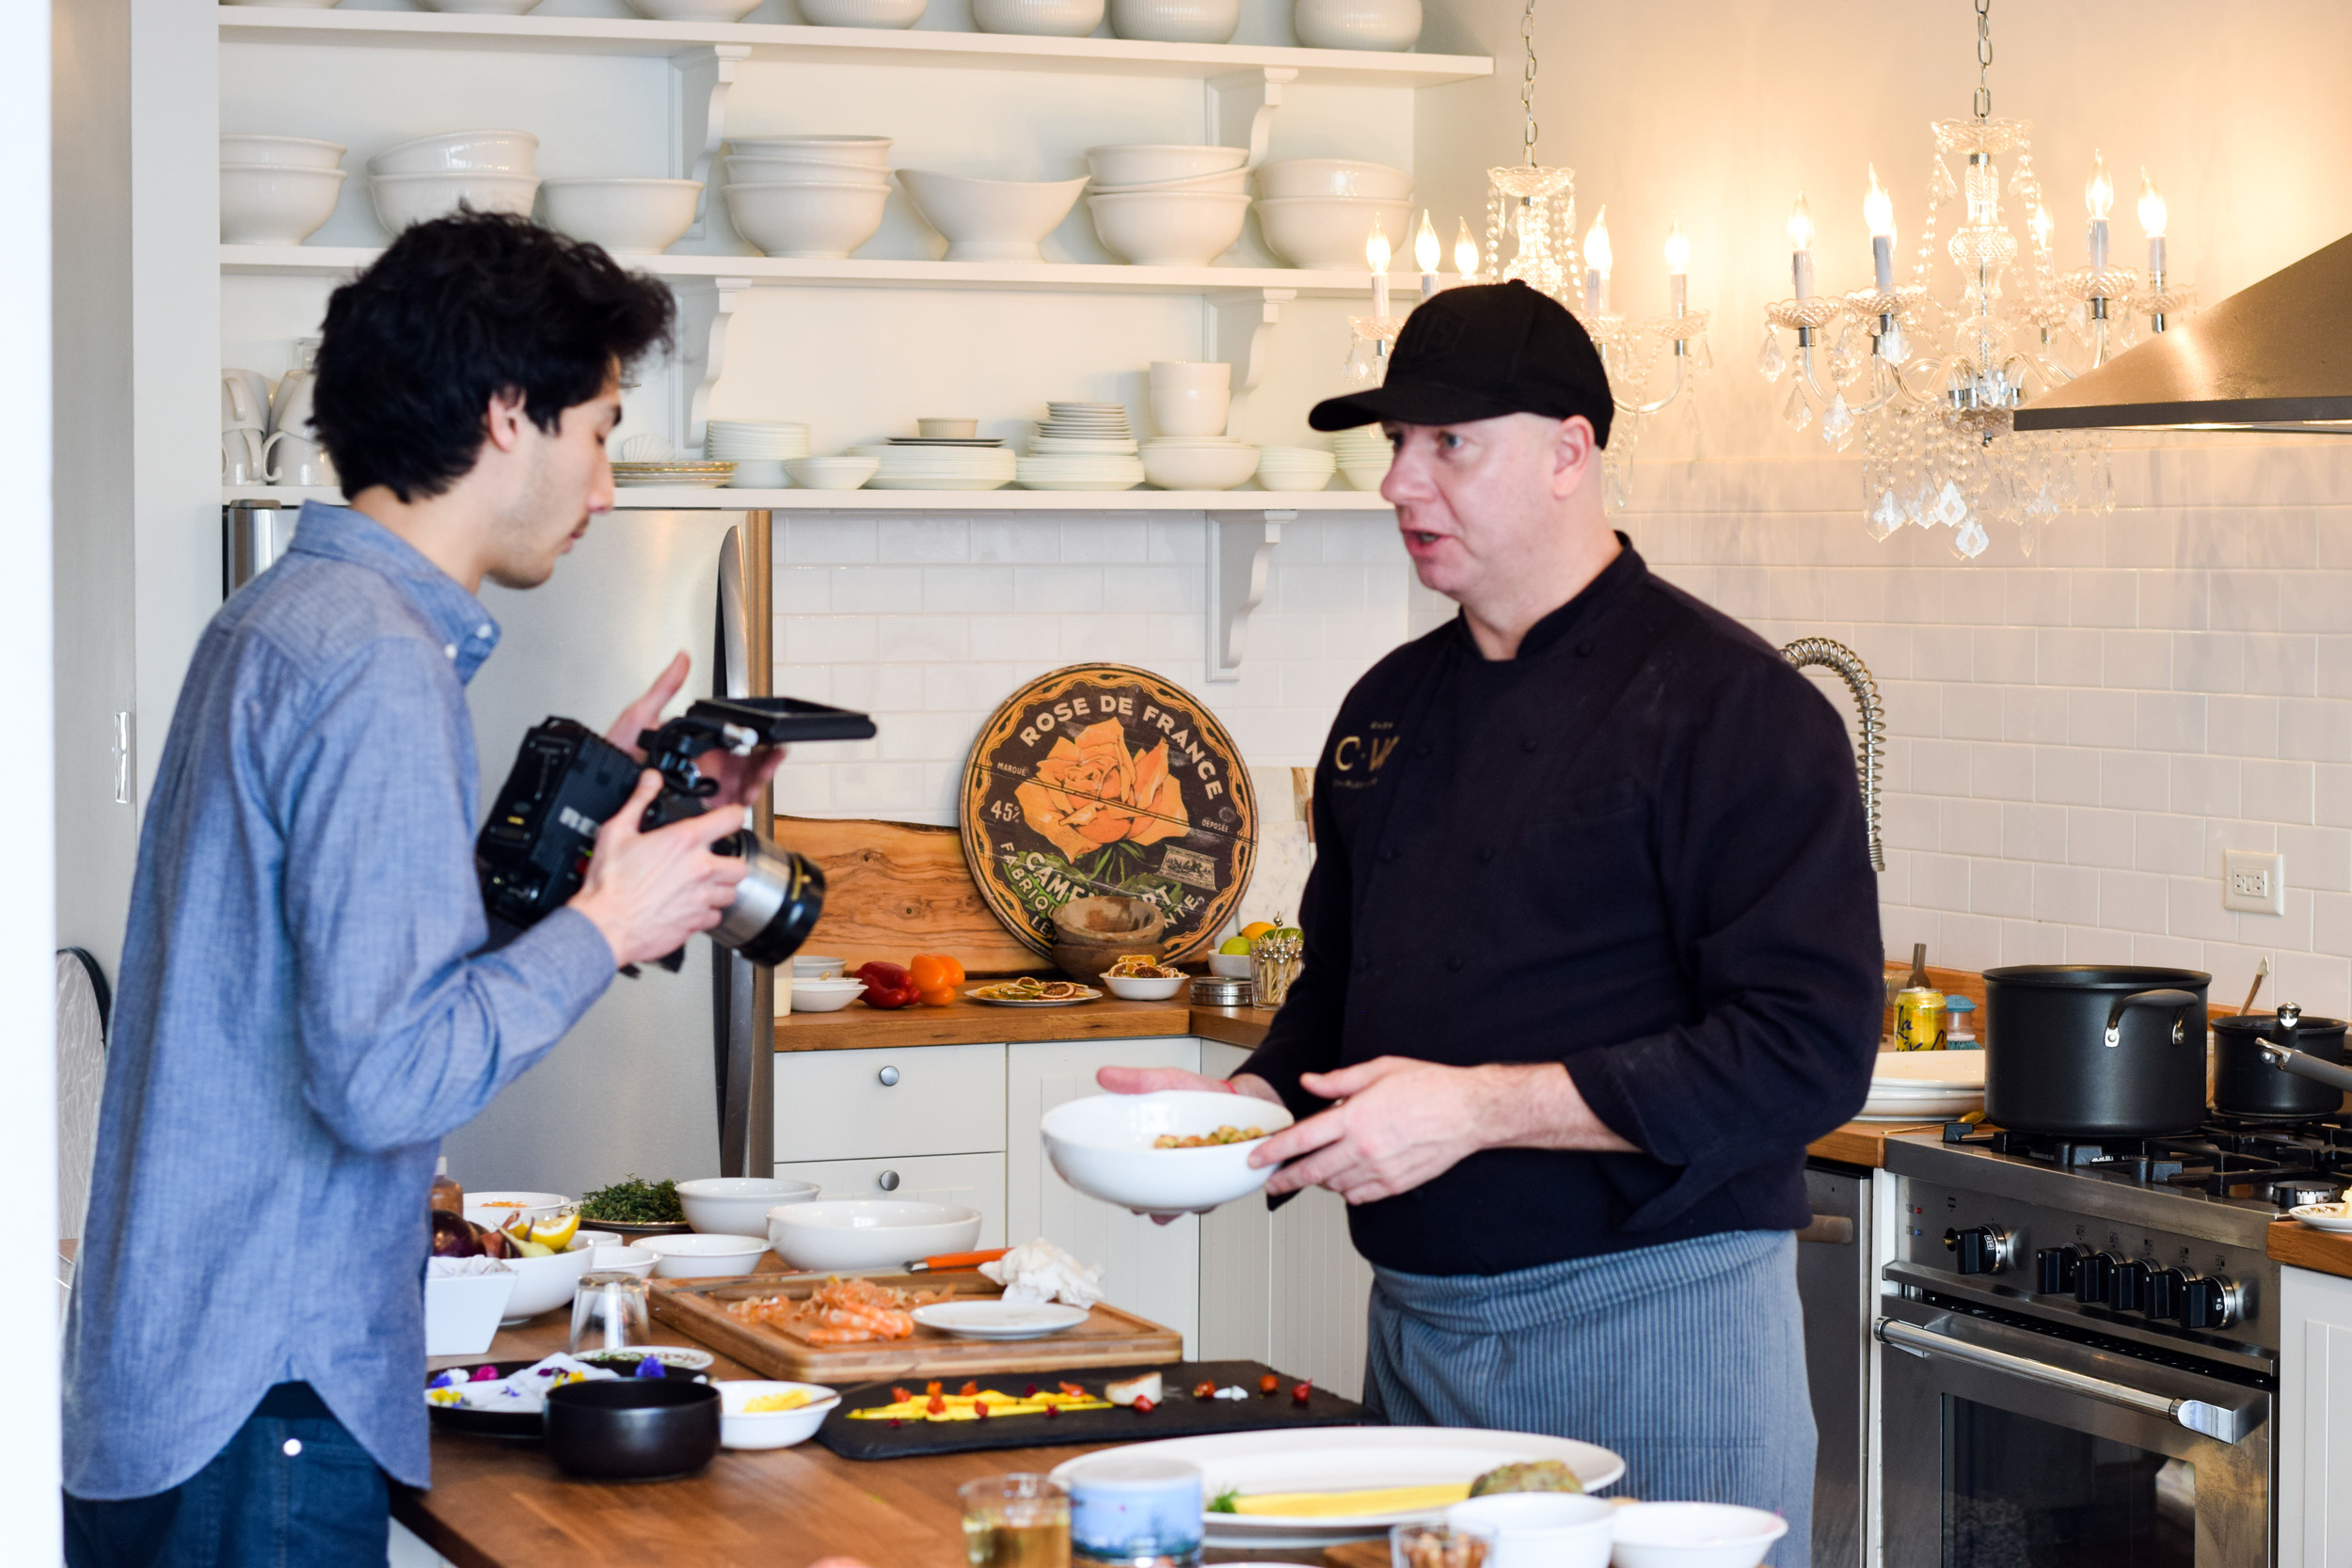 Eric Formato Formatografia photography Maura Gaughan Video Production Entreprenuership Charles Webb Chef Culinary Art -81.jpg